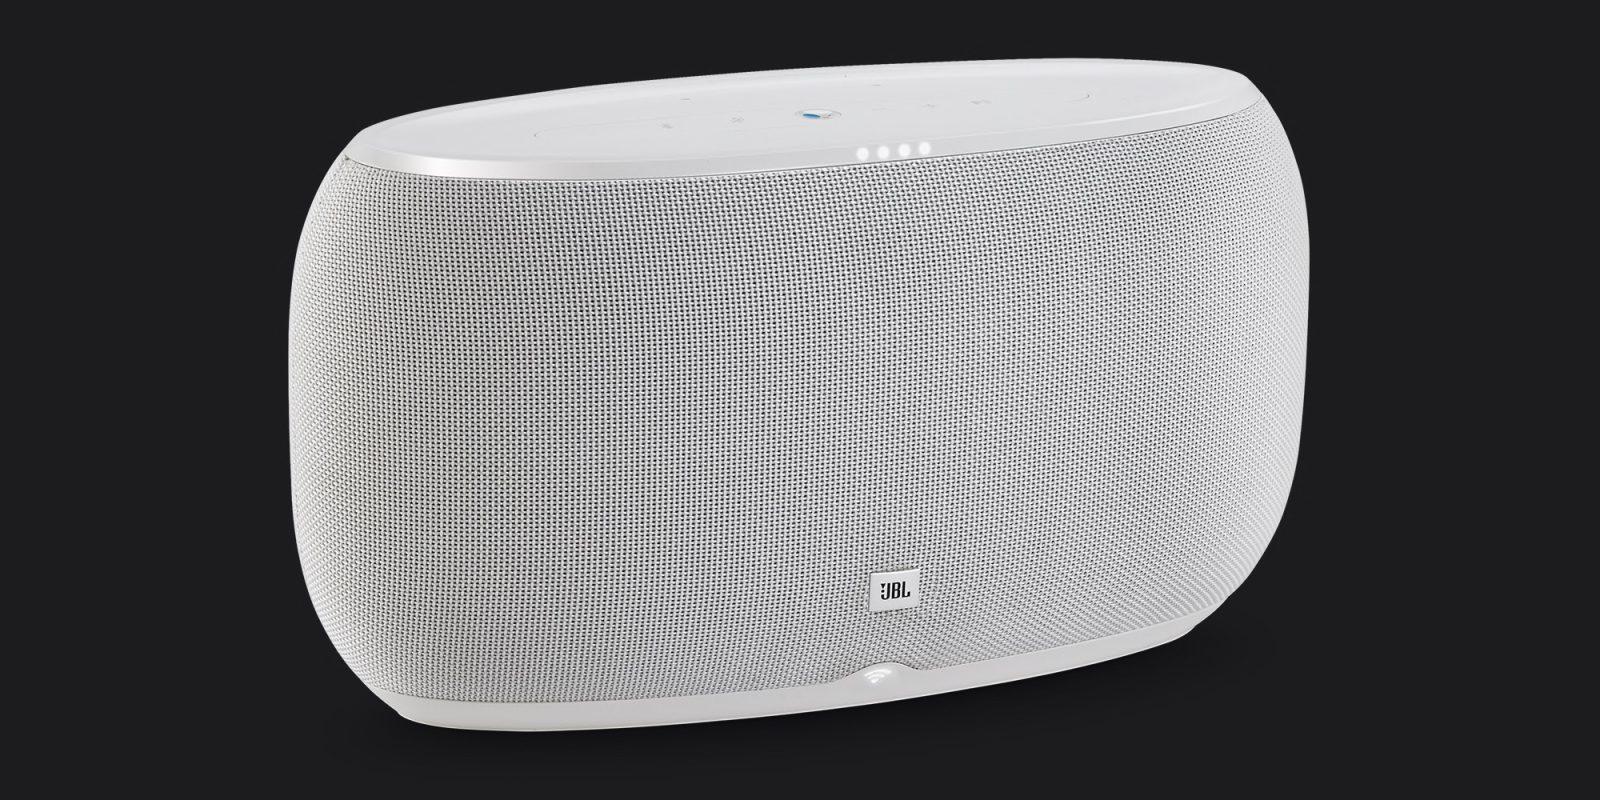 Save $250 on the JBL Link 500 Google Assistant Speaker, now on sale for $150